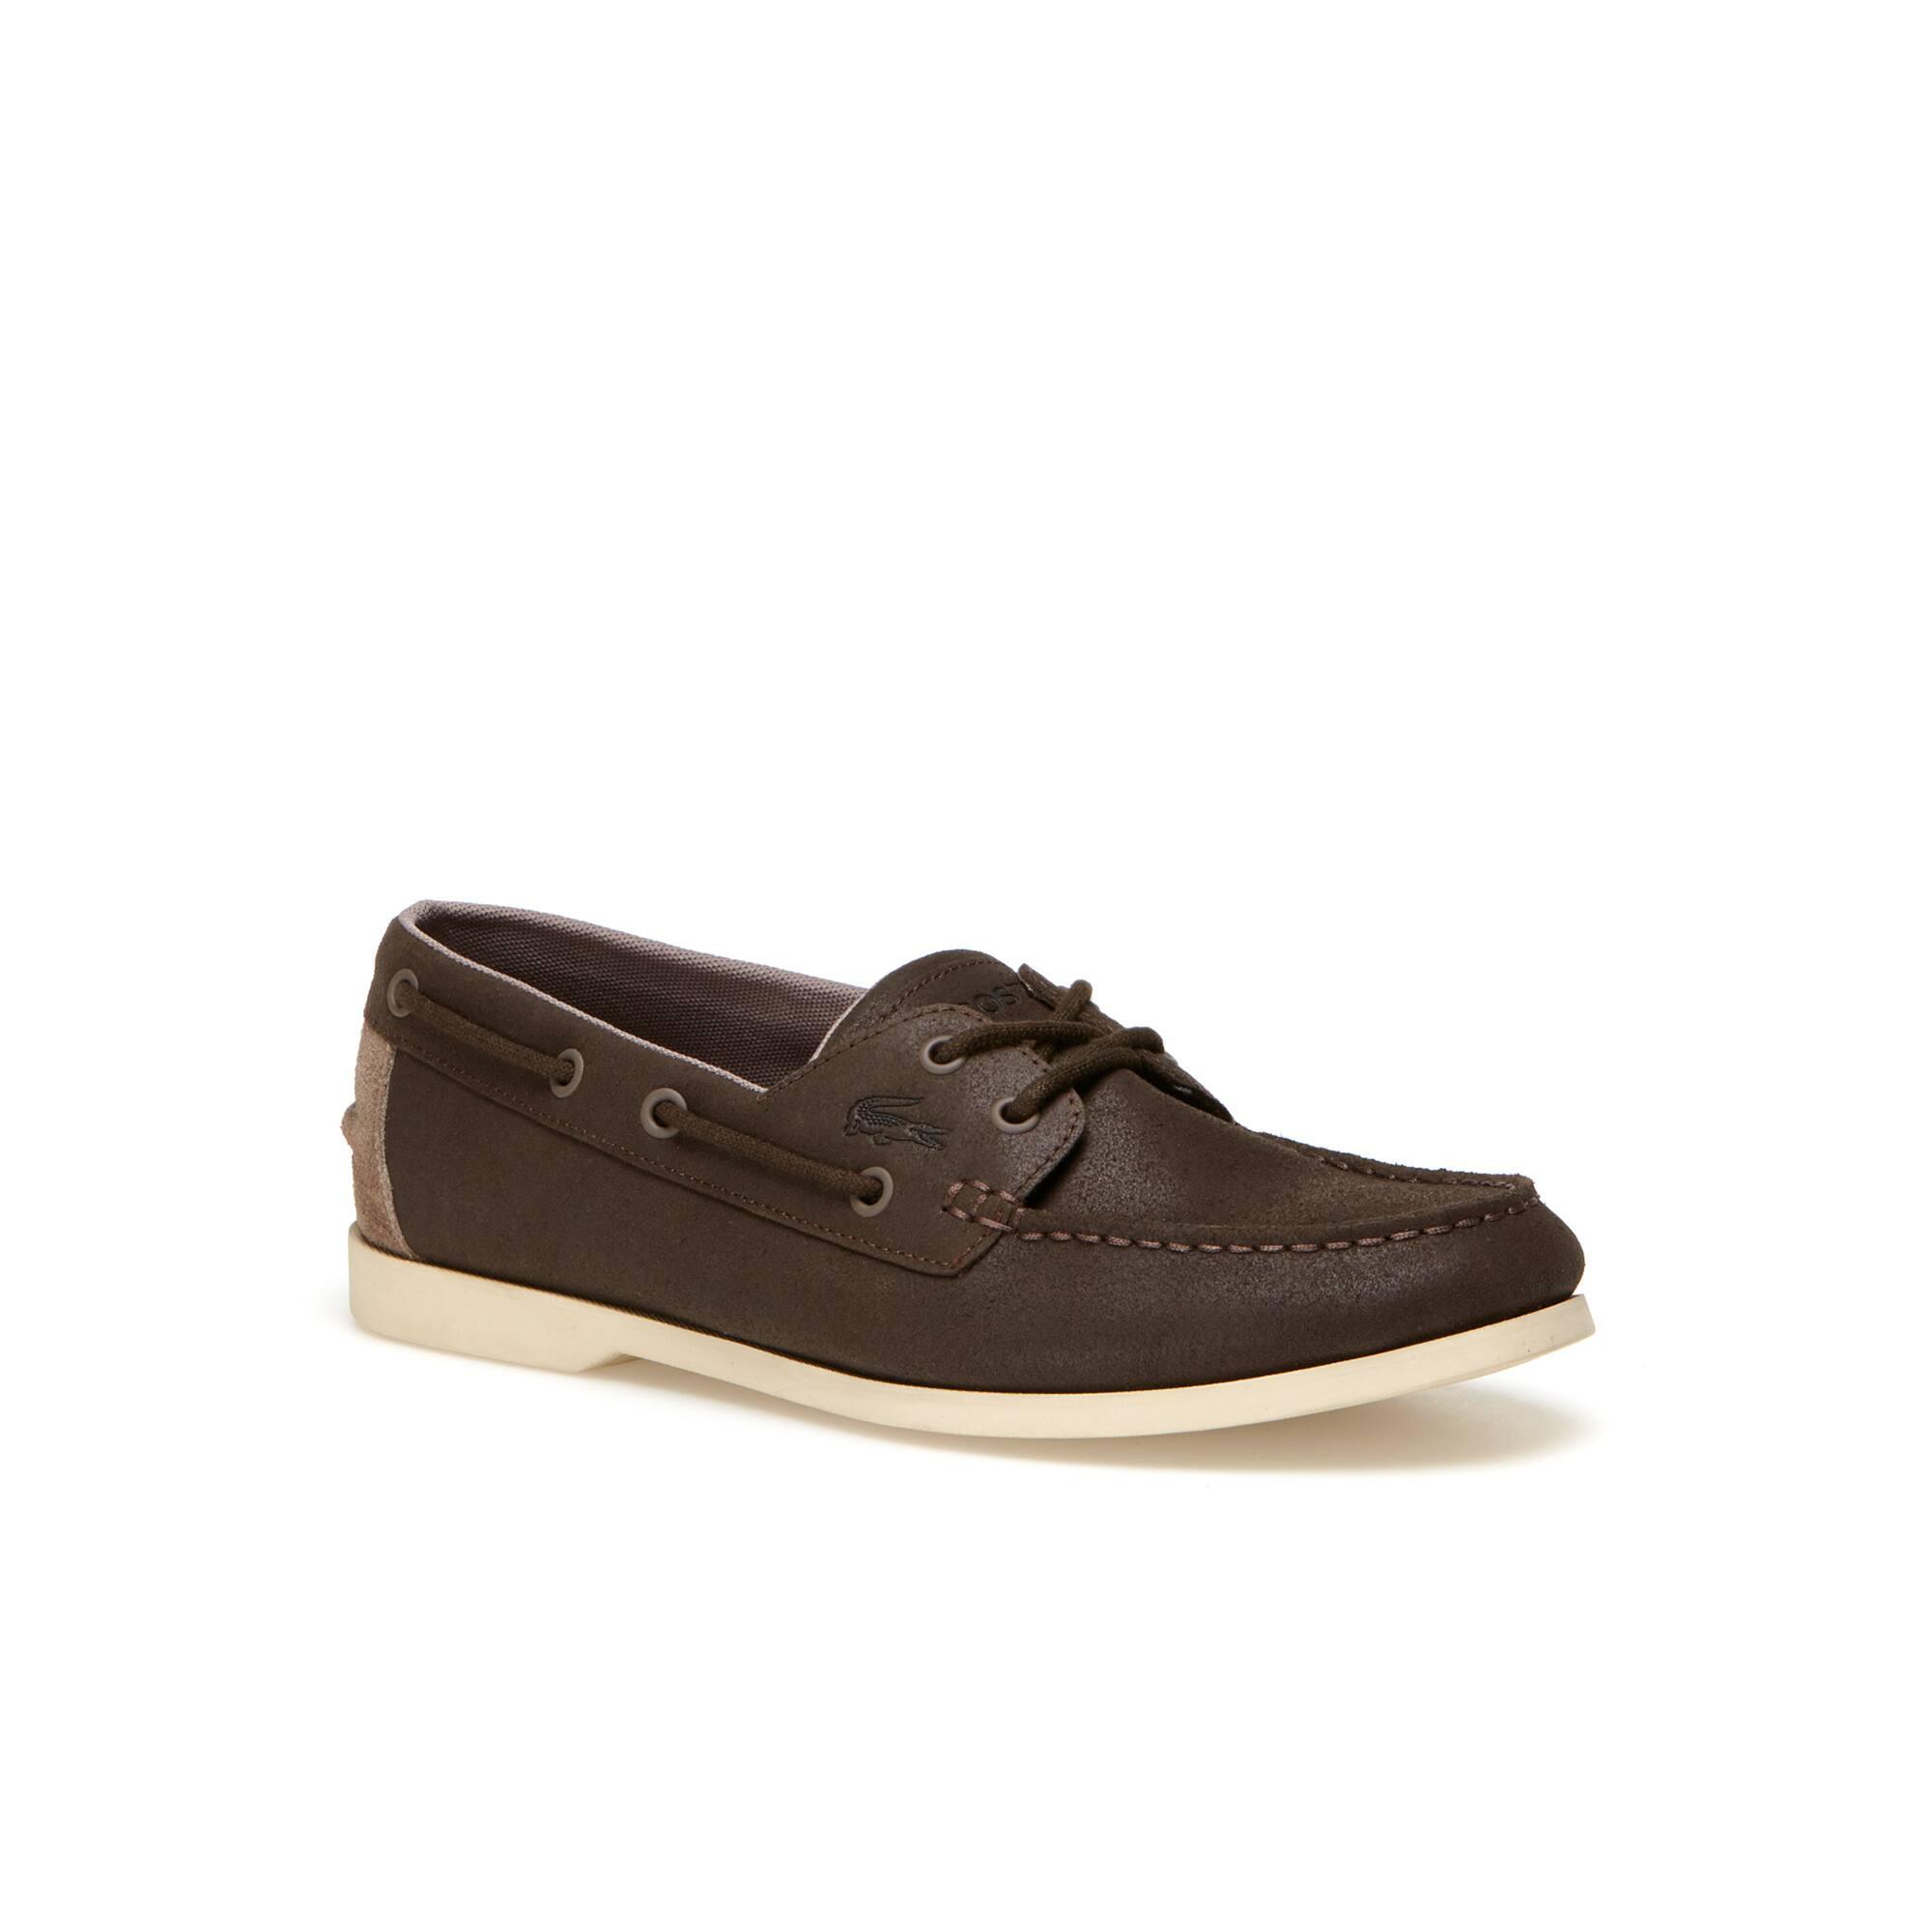 Men's Navire Casual Suedette Boat Shoes